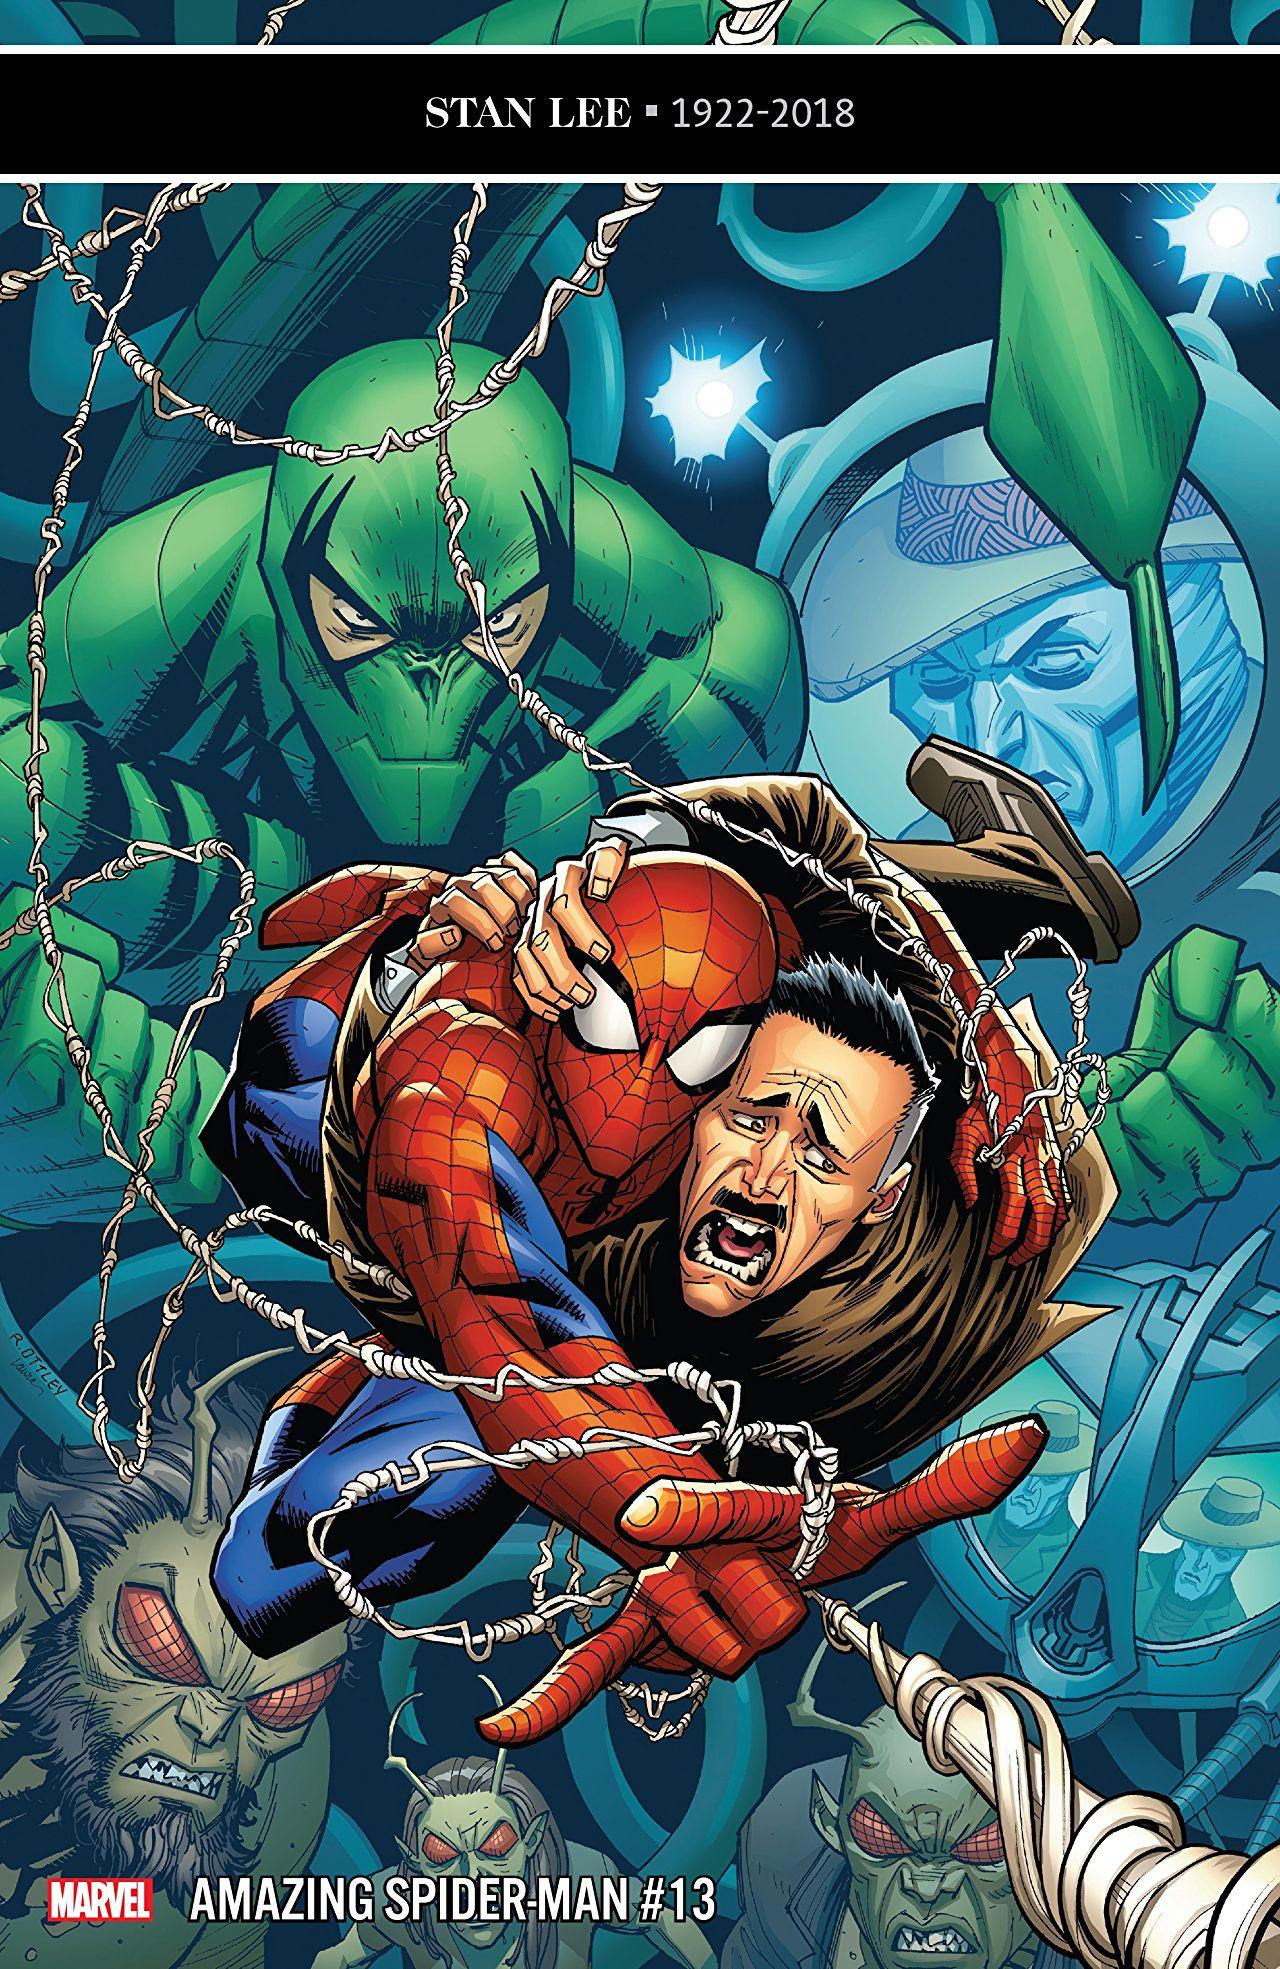 The Amazing Spider-Man 13